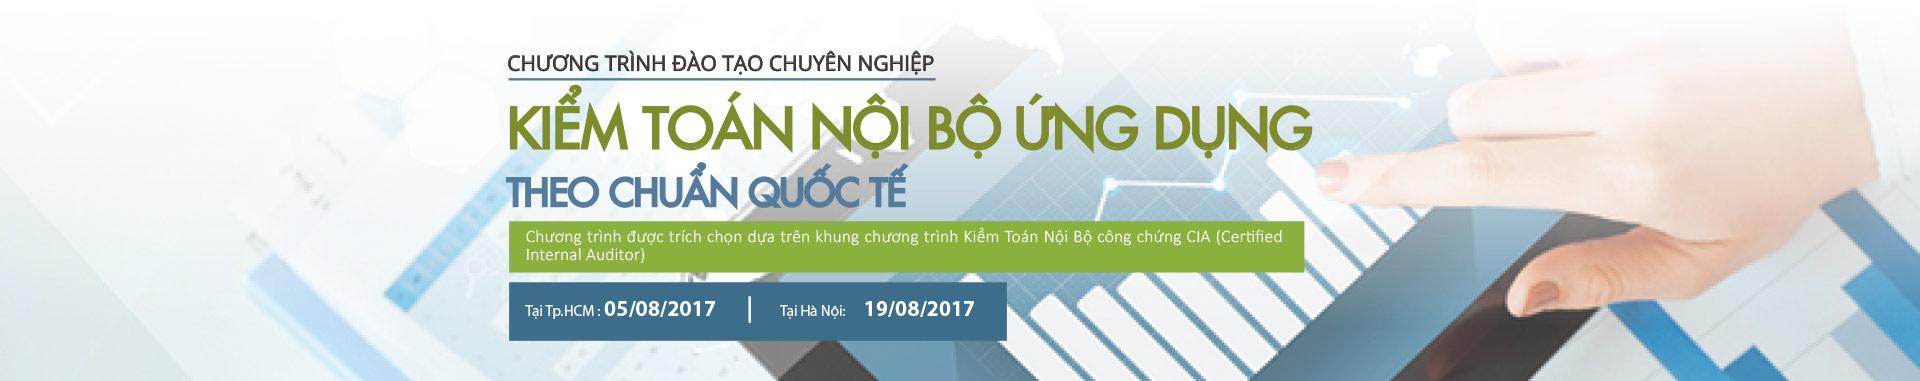 banner-web-ktnb-ung-dung-050817